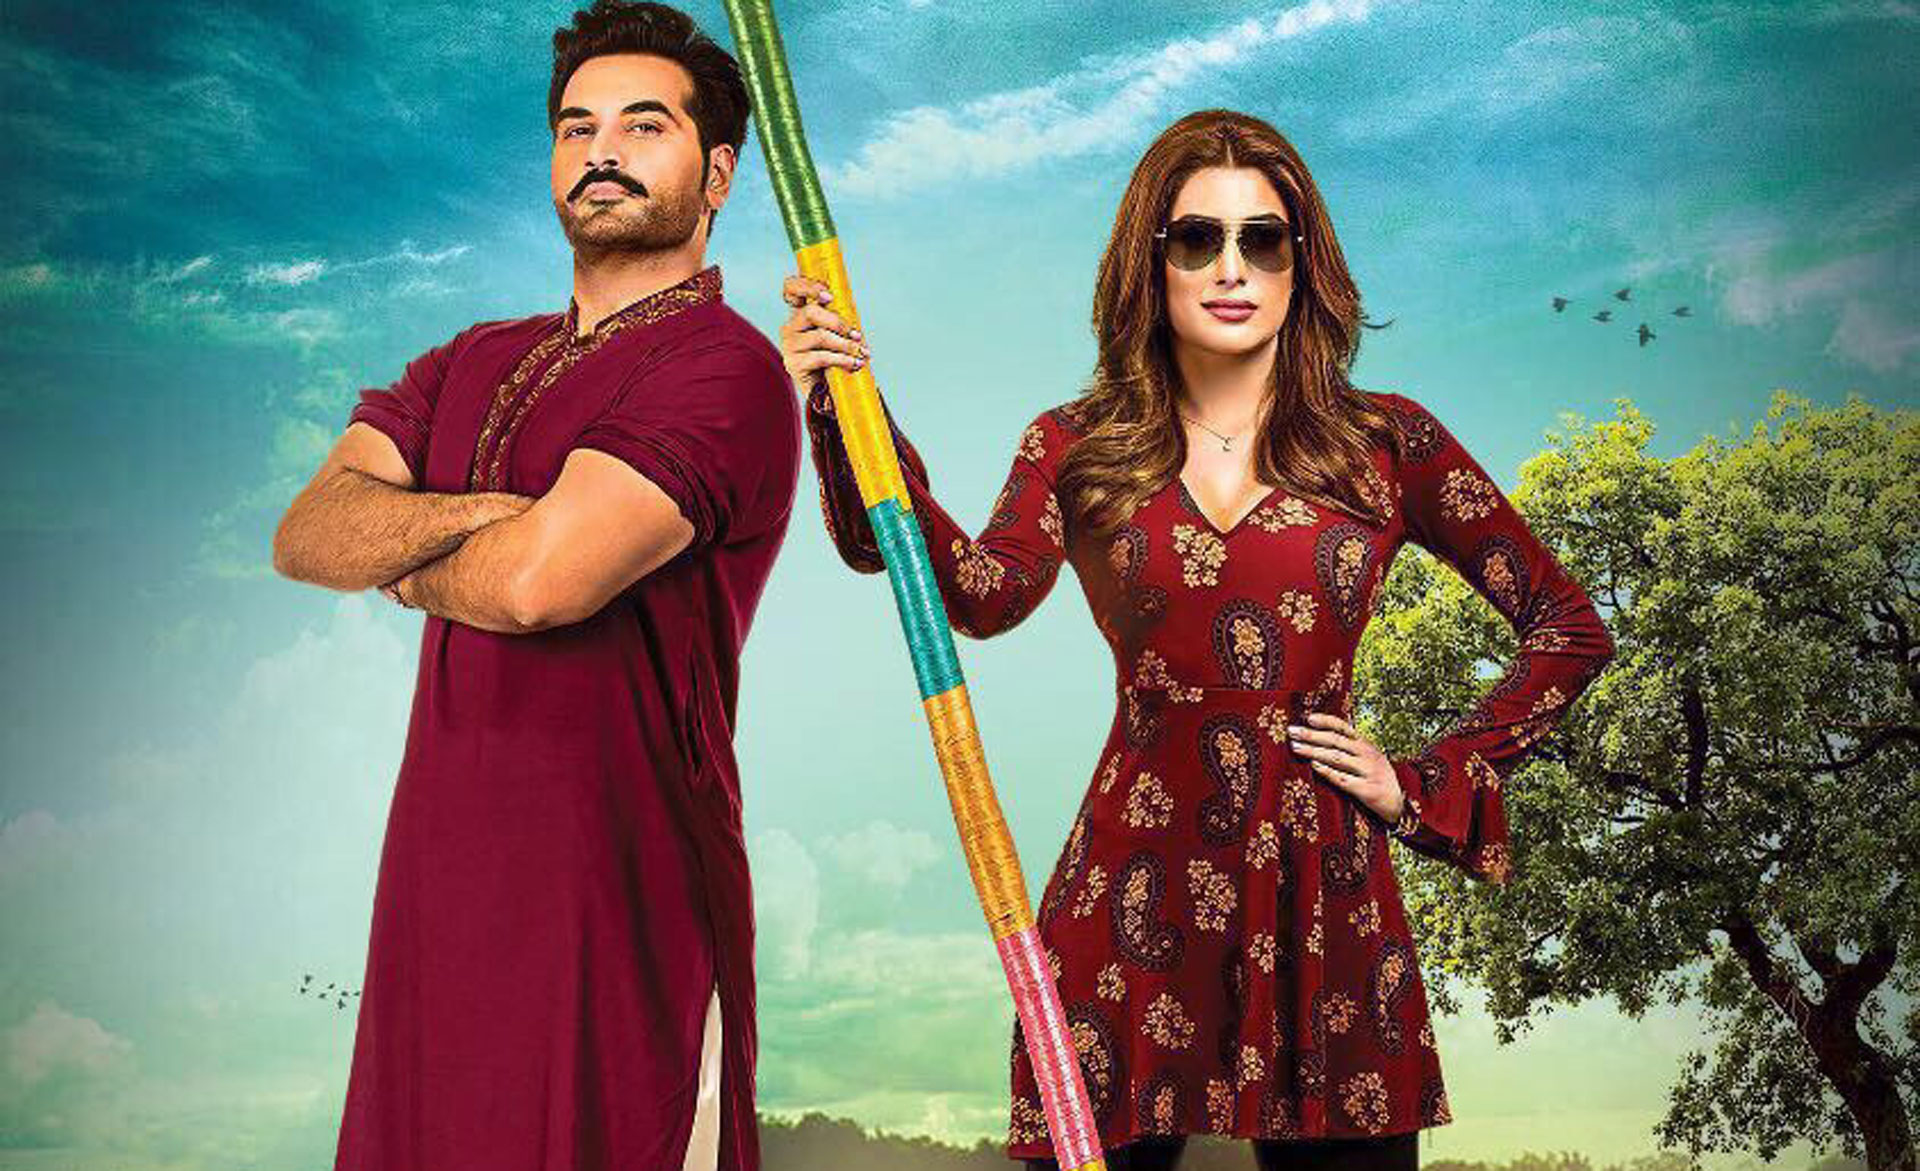 Gohar Rasheed Has Just Signed This Star-Studded Film